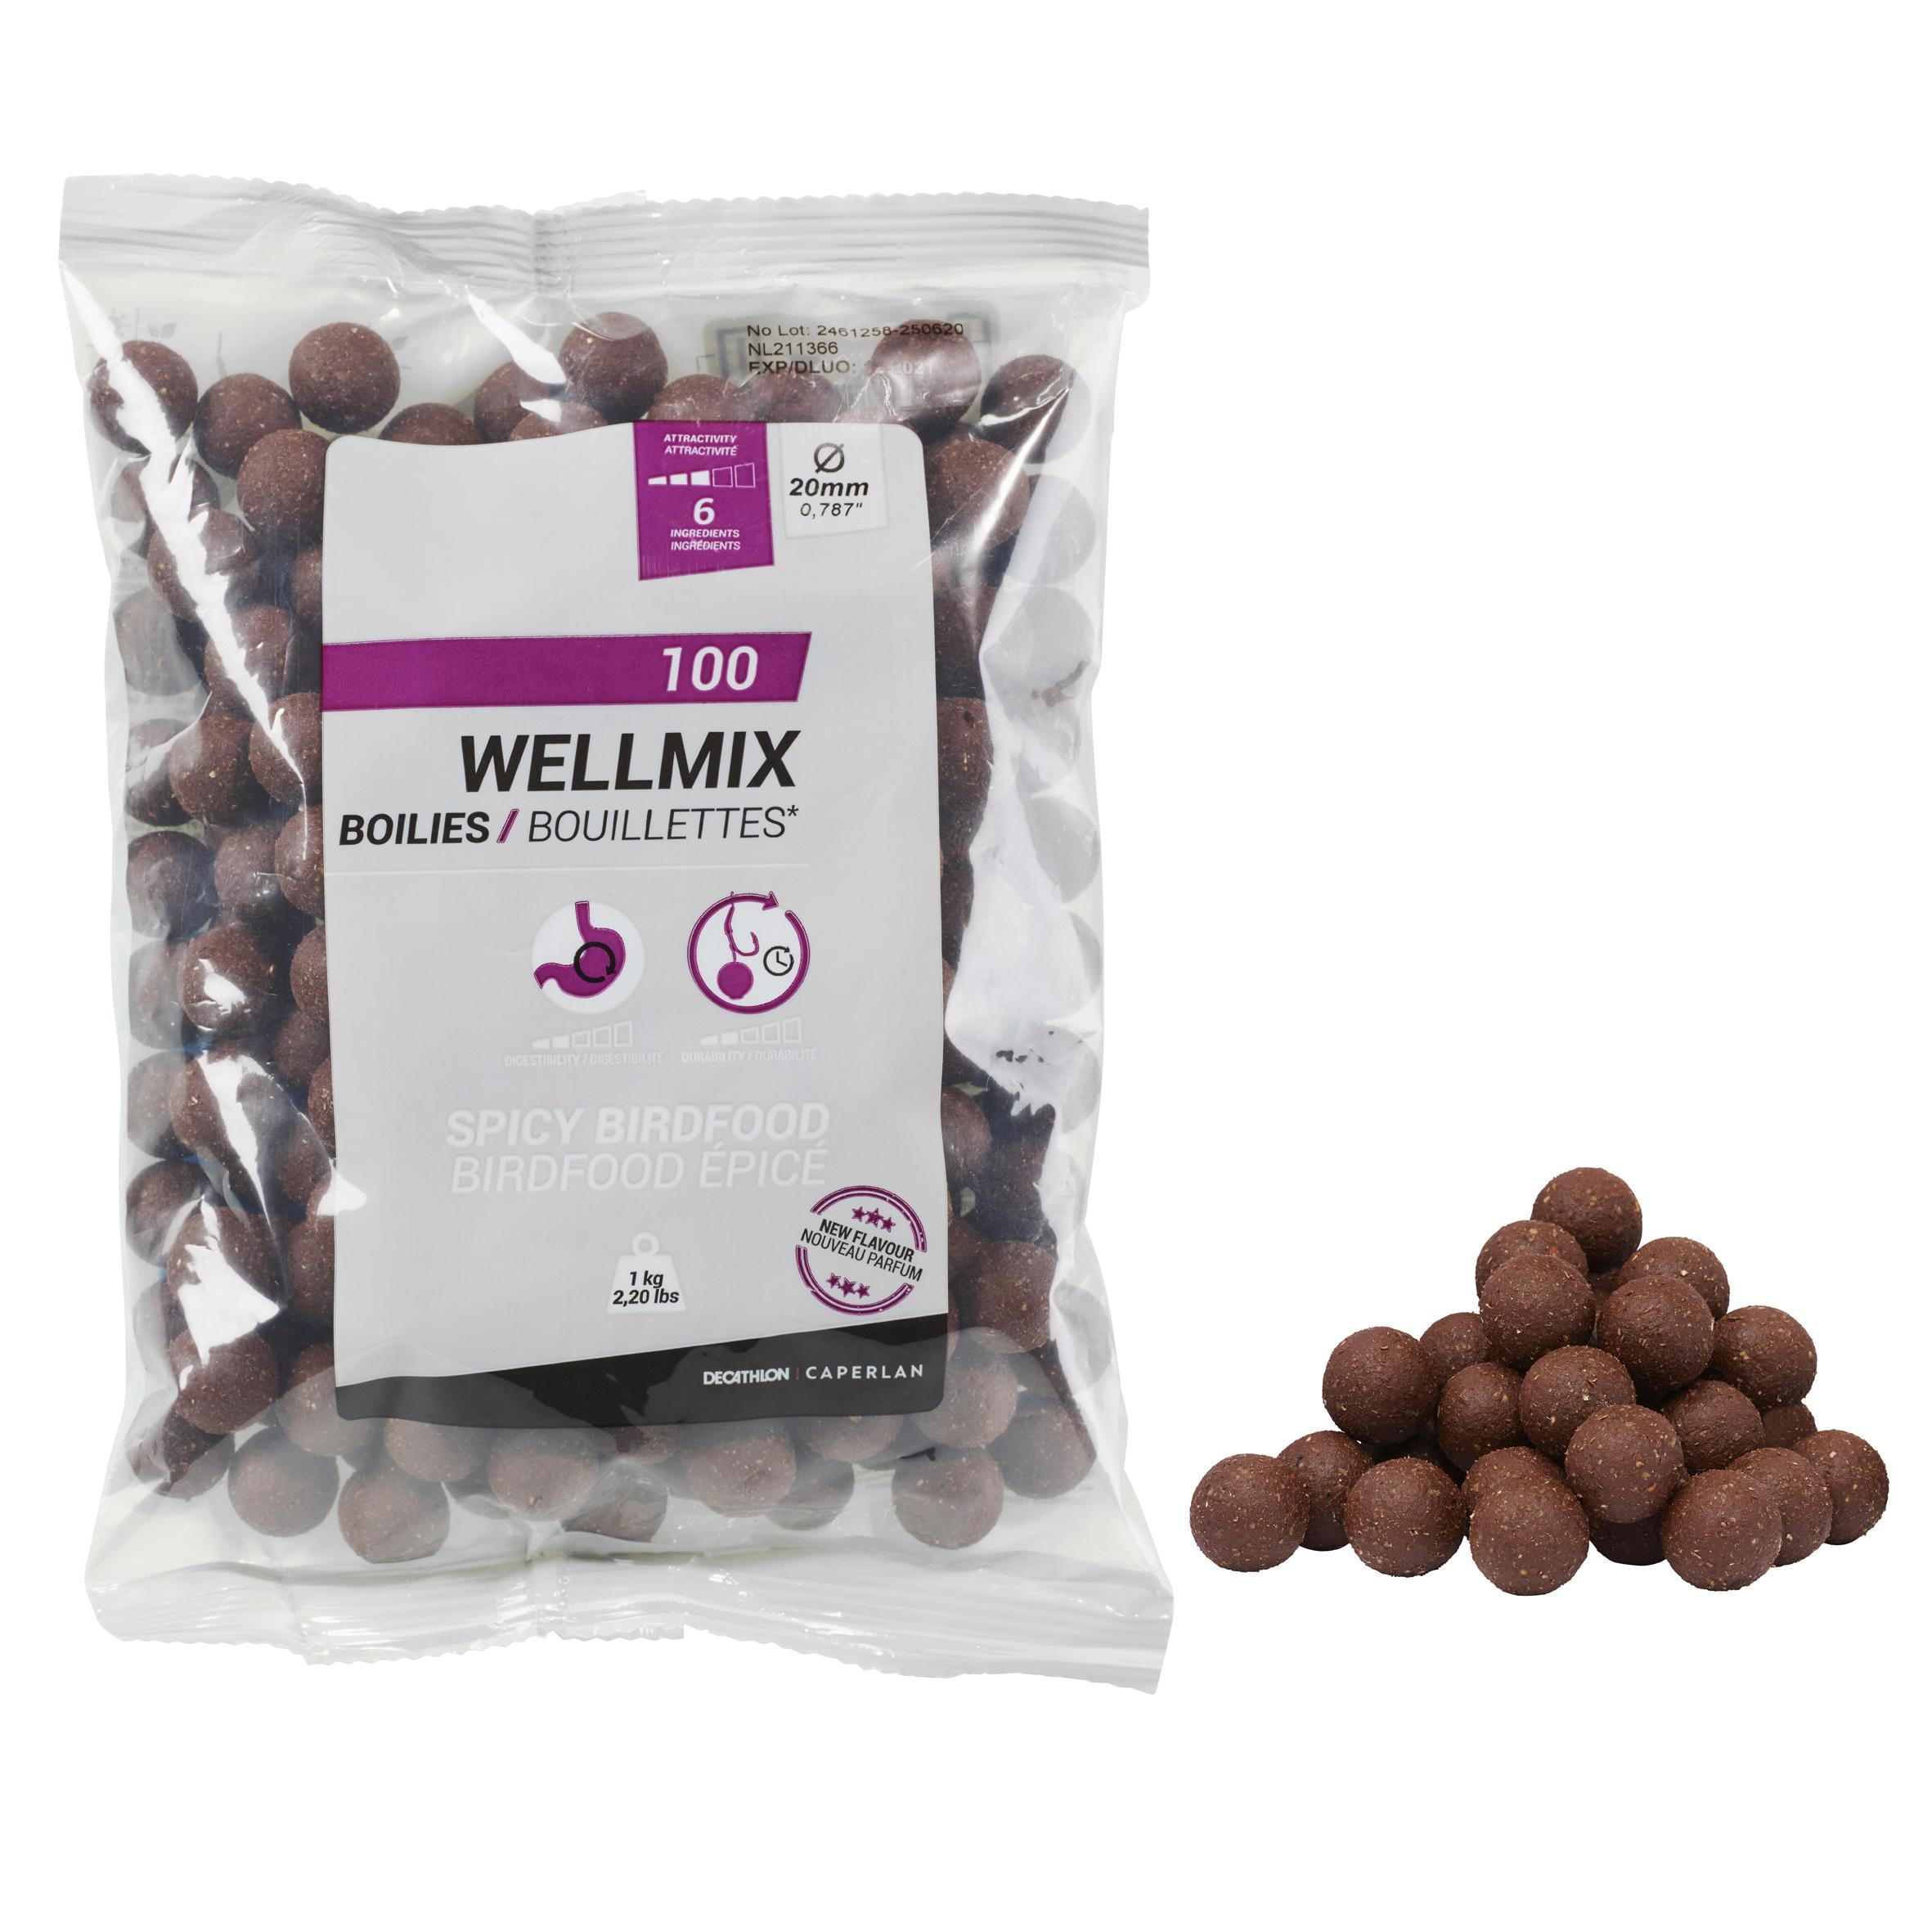 Boilies Wellmix 20mm 1kg imagine